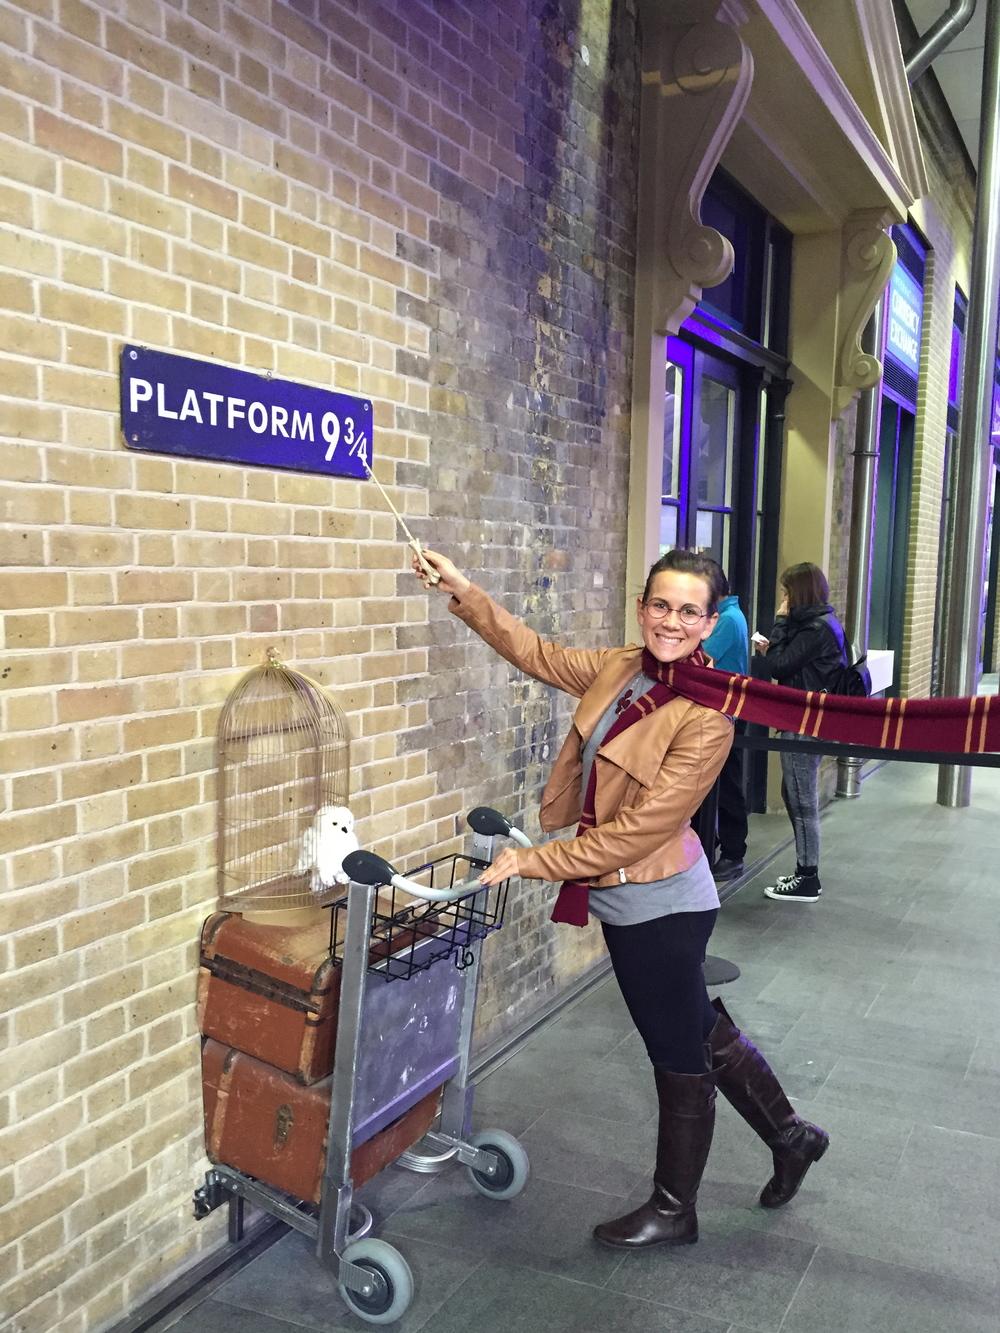 Anna Platform 9 3/4